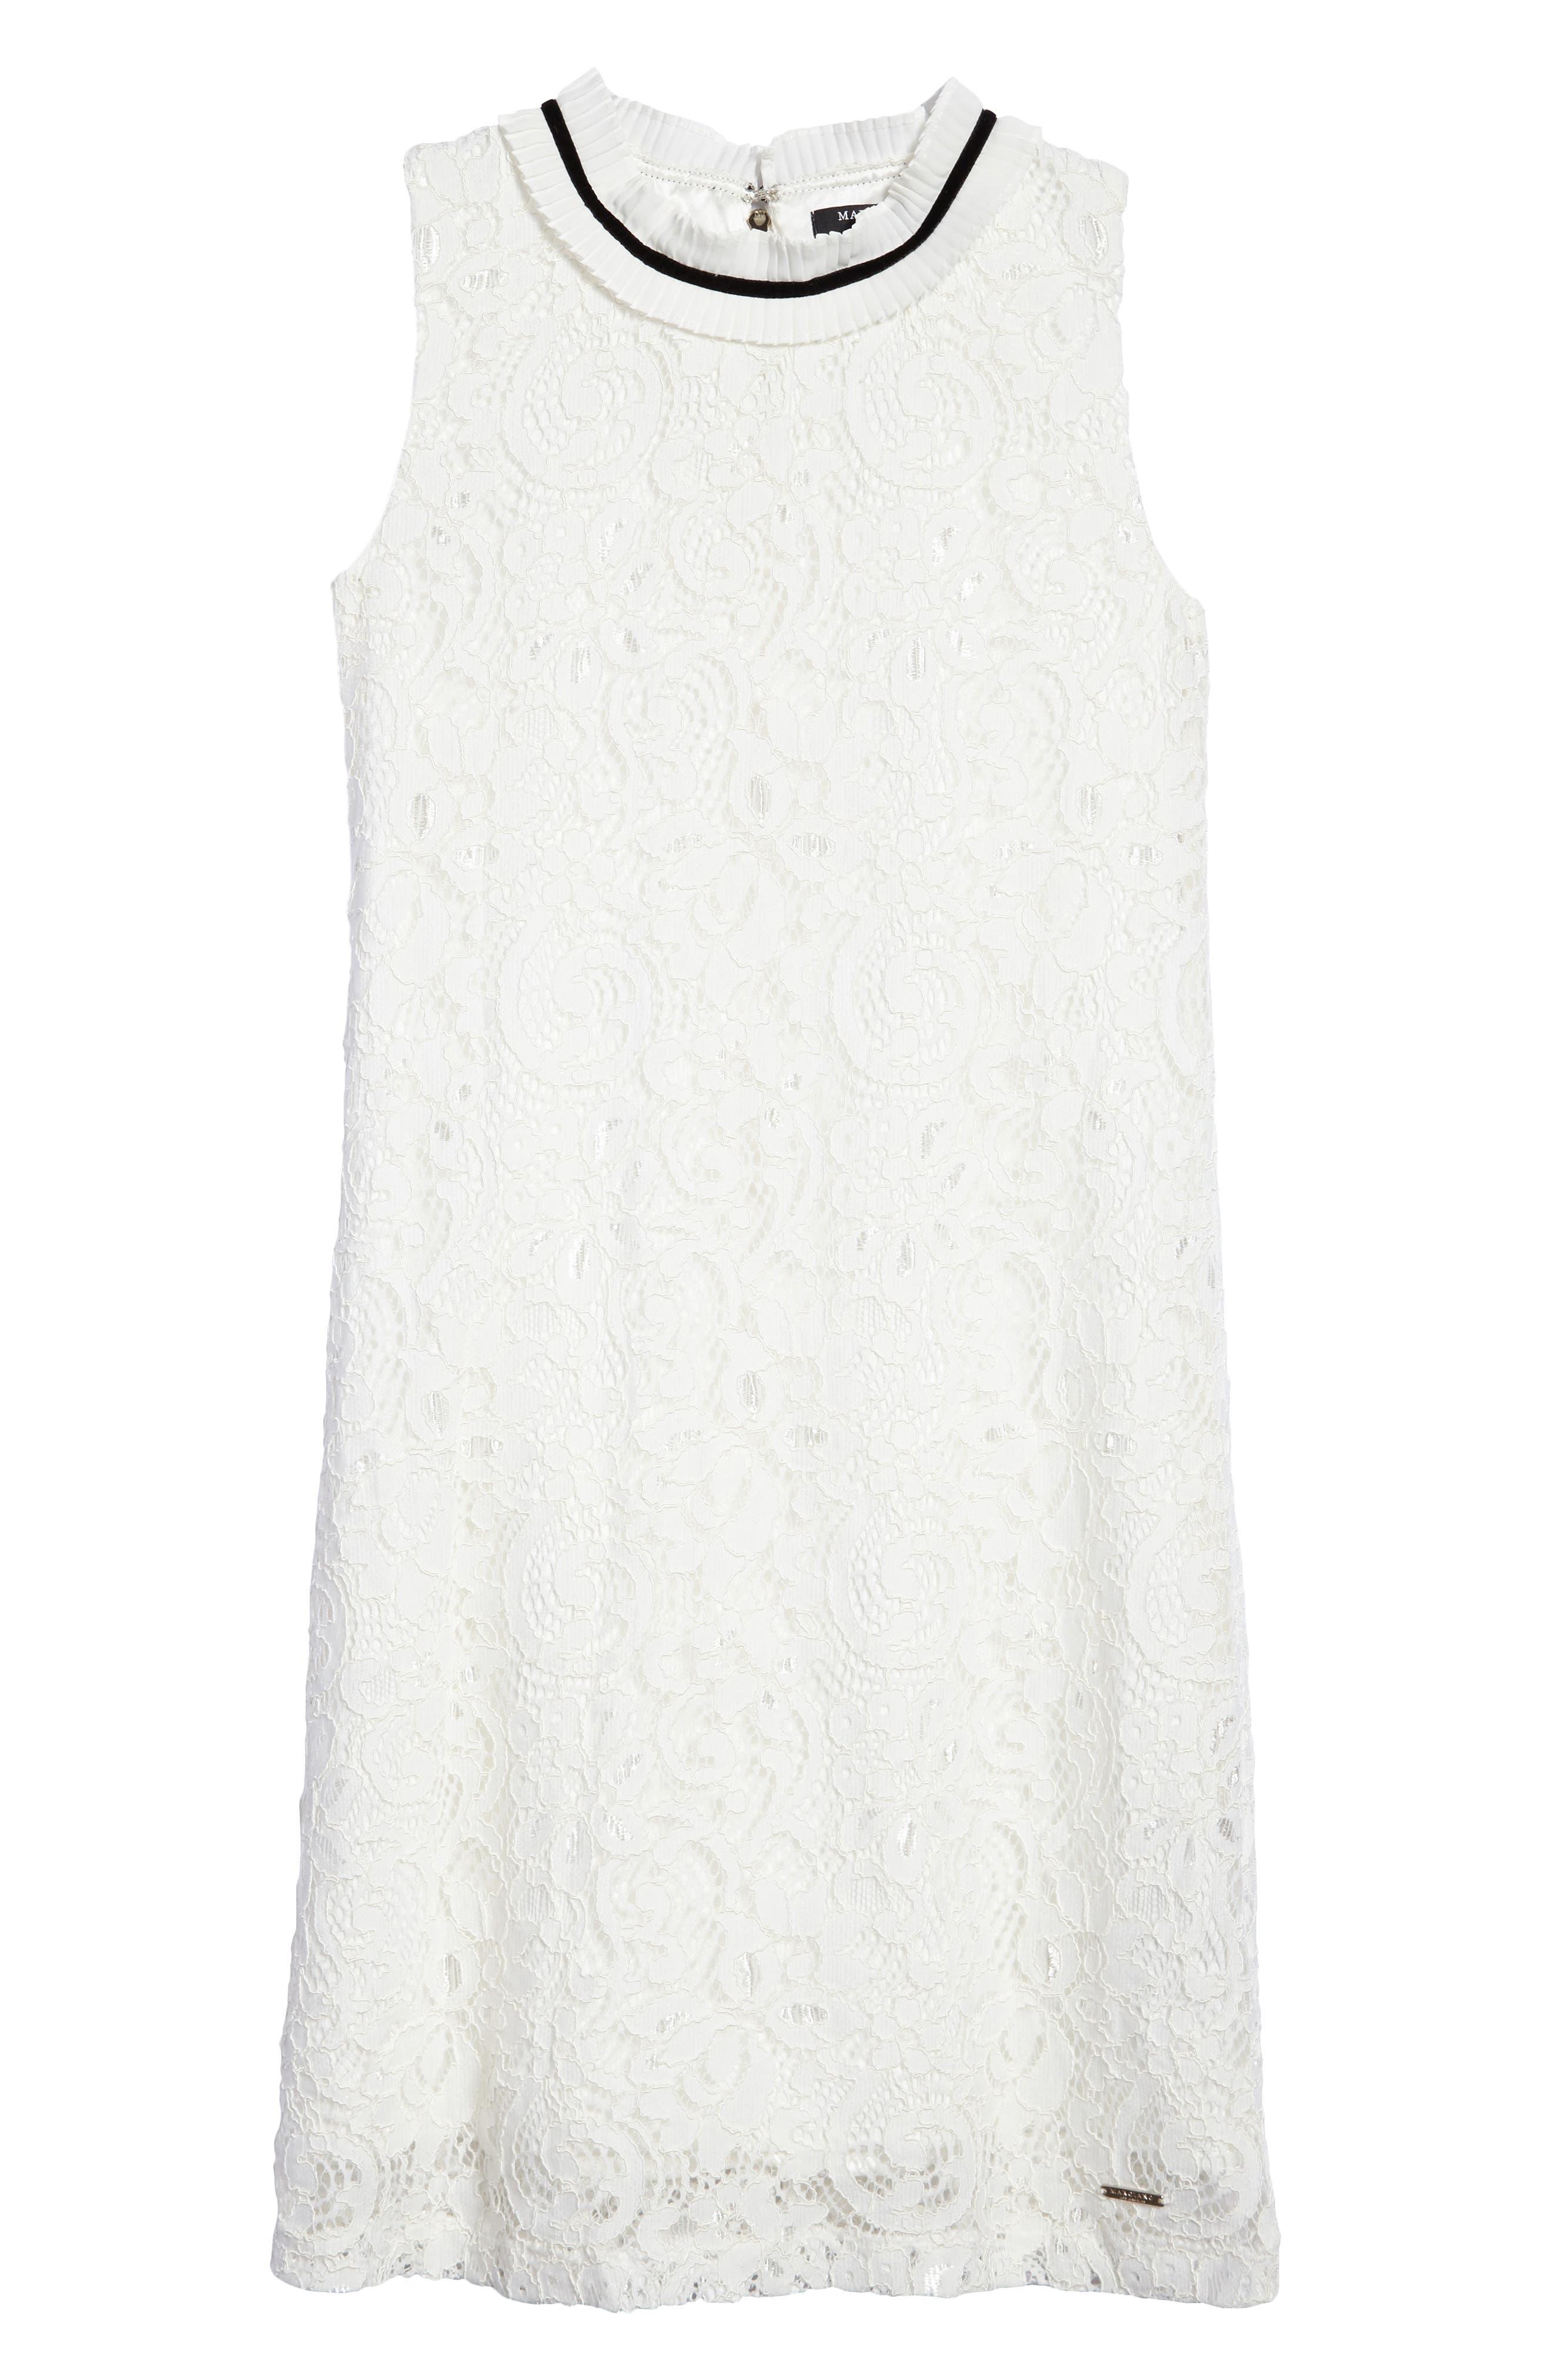 Alternate Image 1 Selected - Marciano Sleeveless Lace Dress (Big Girls)